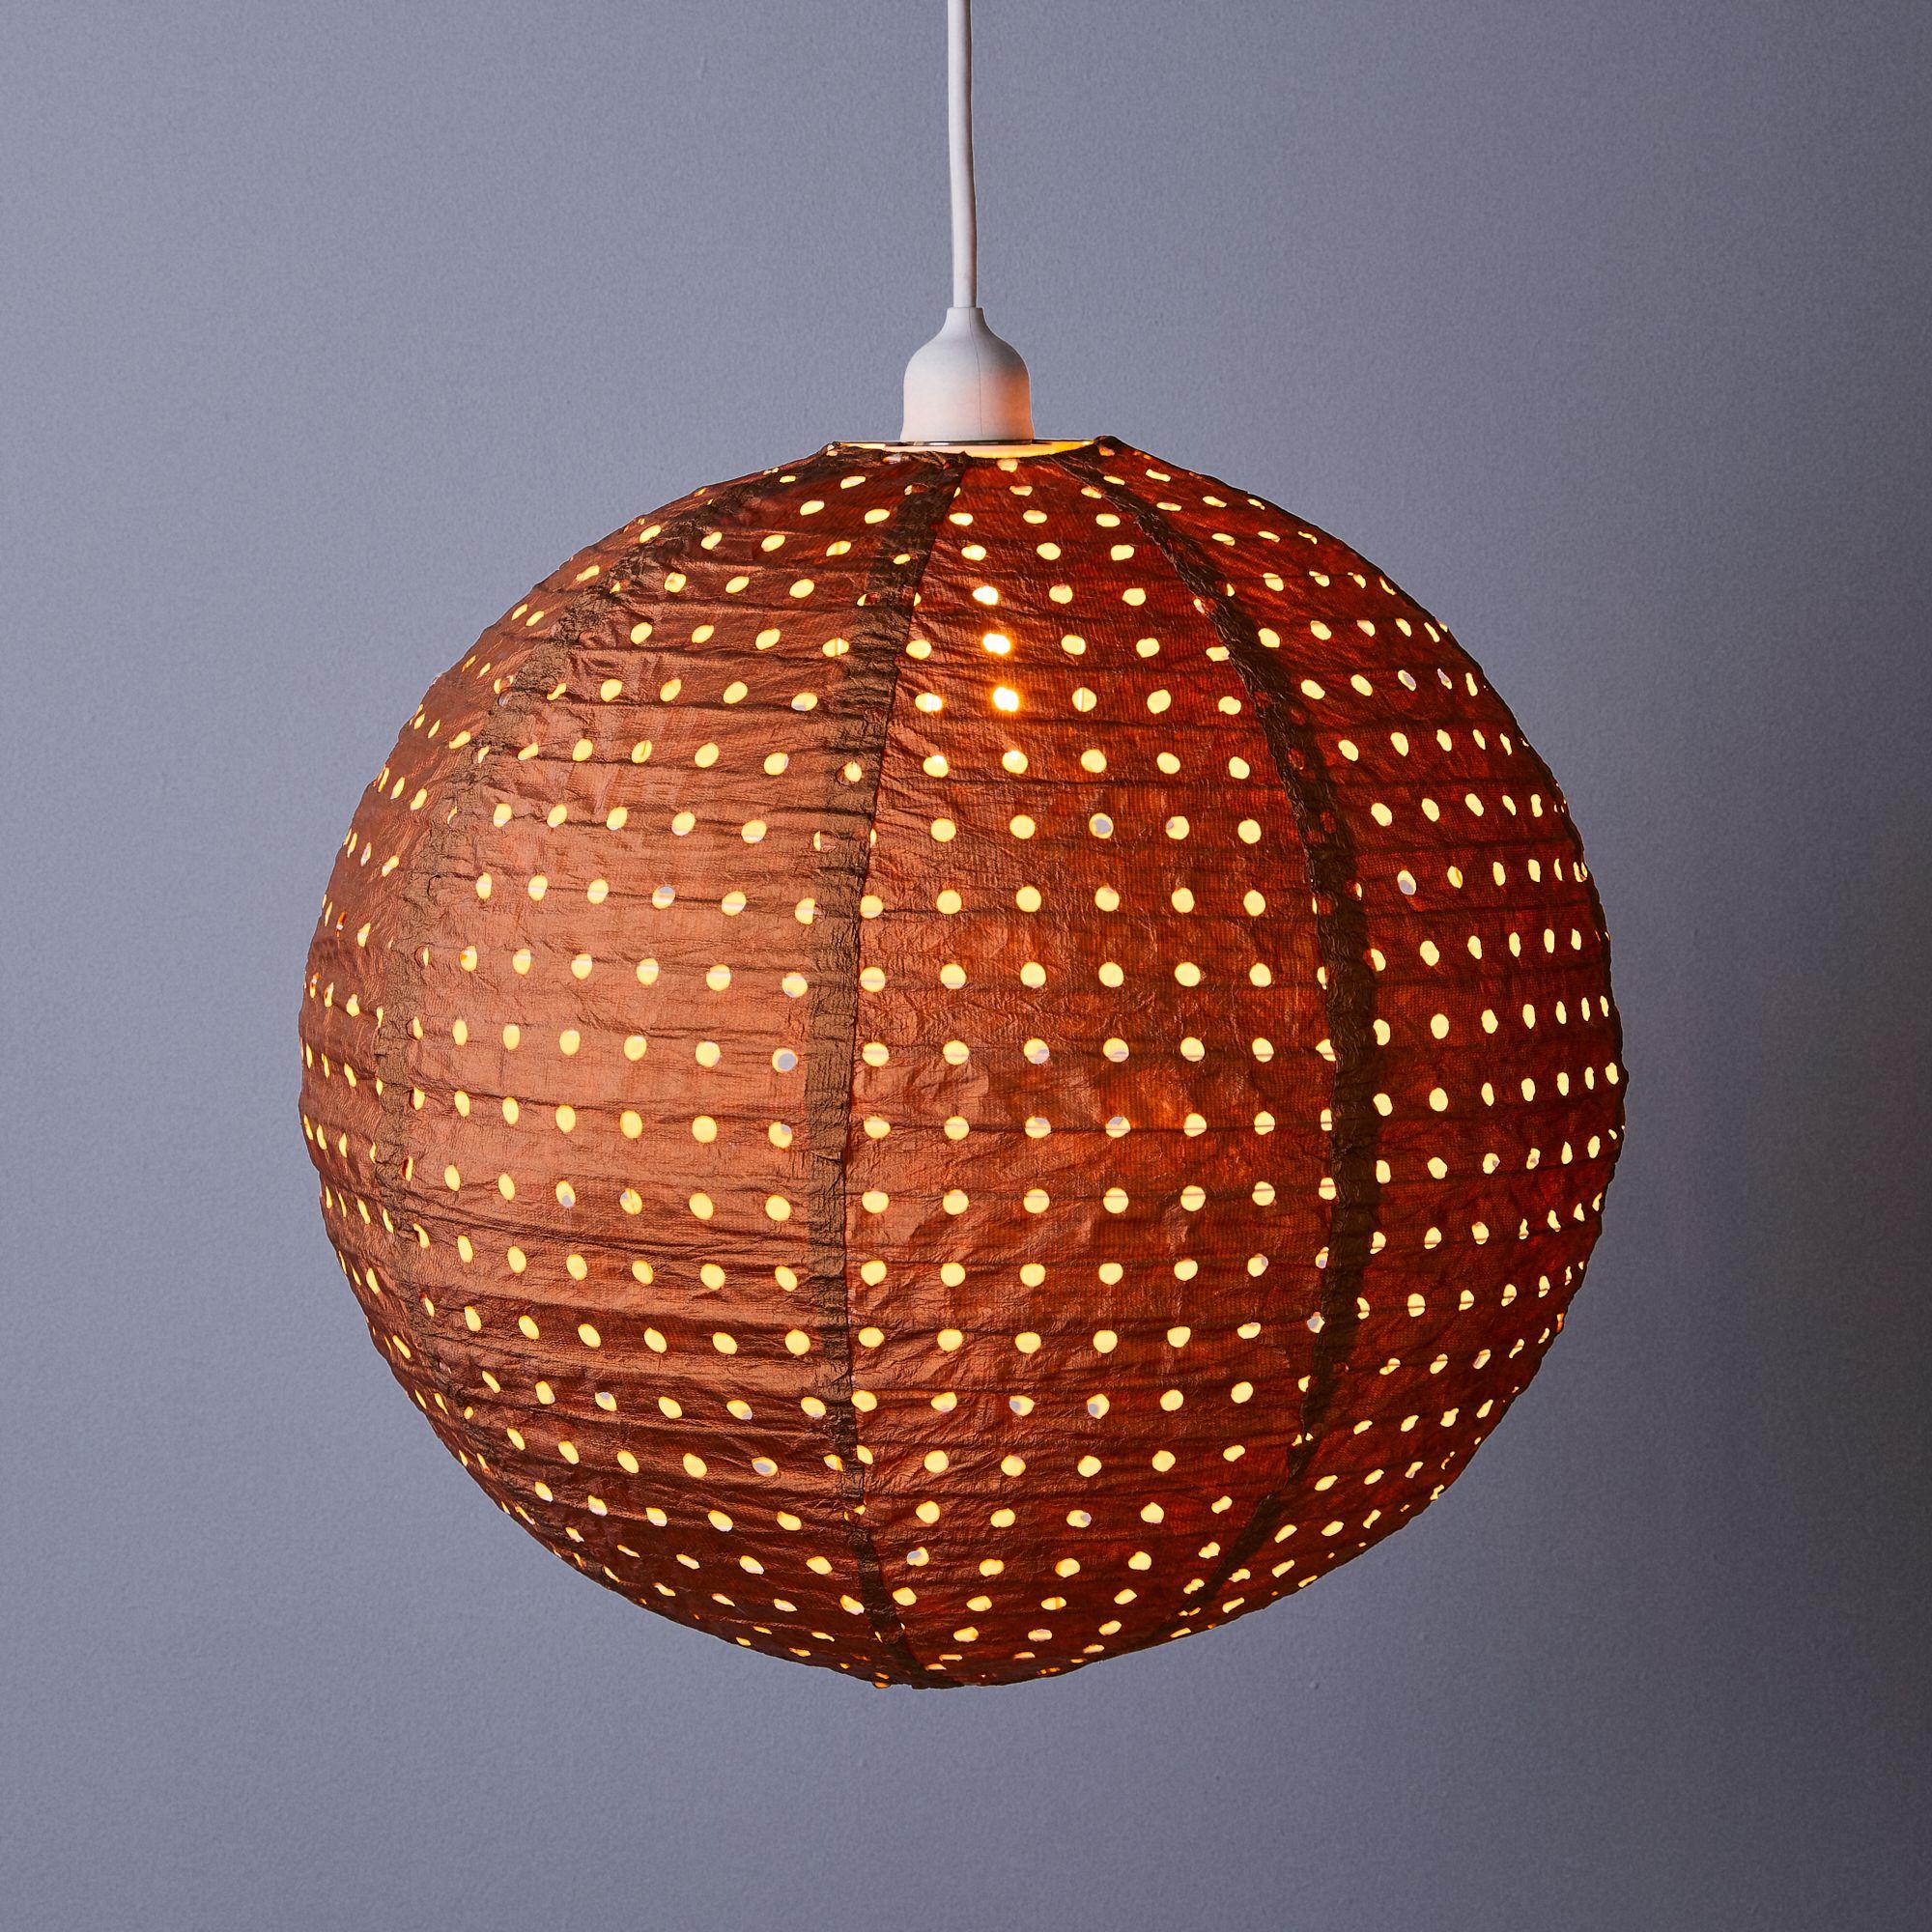 Lanterns by Constance Pepper